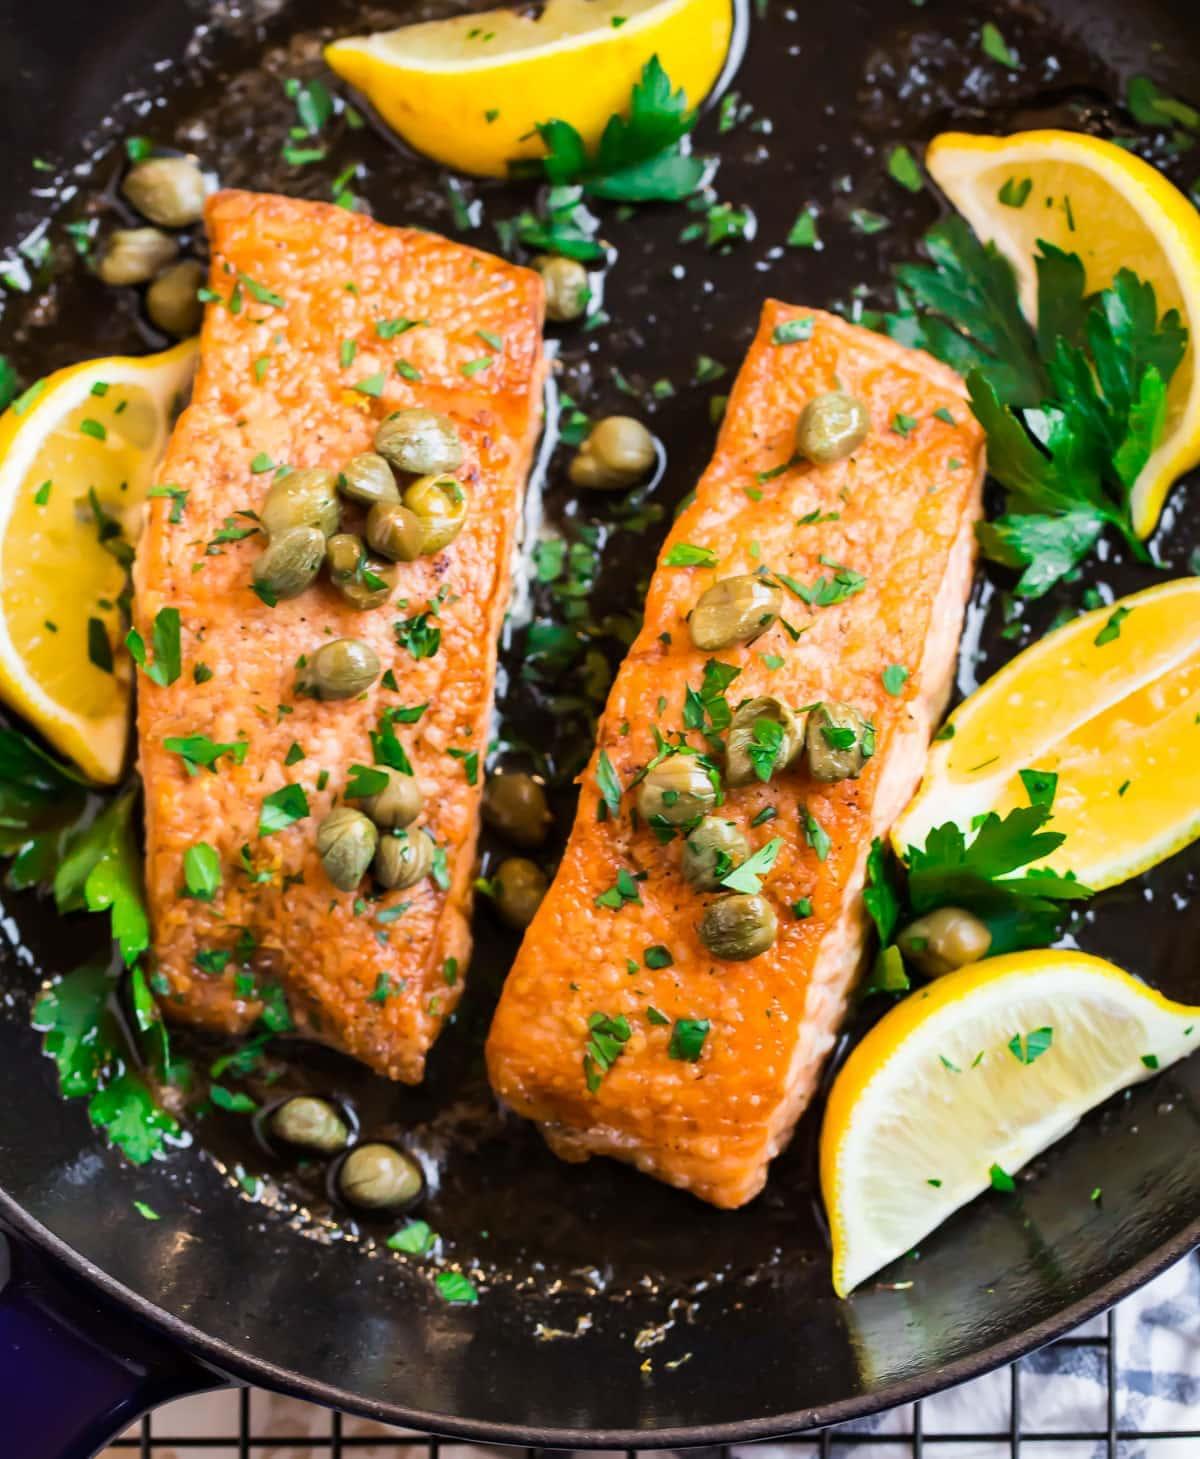 salmon meuniere sauce Salmon Meuniere